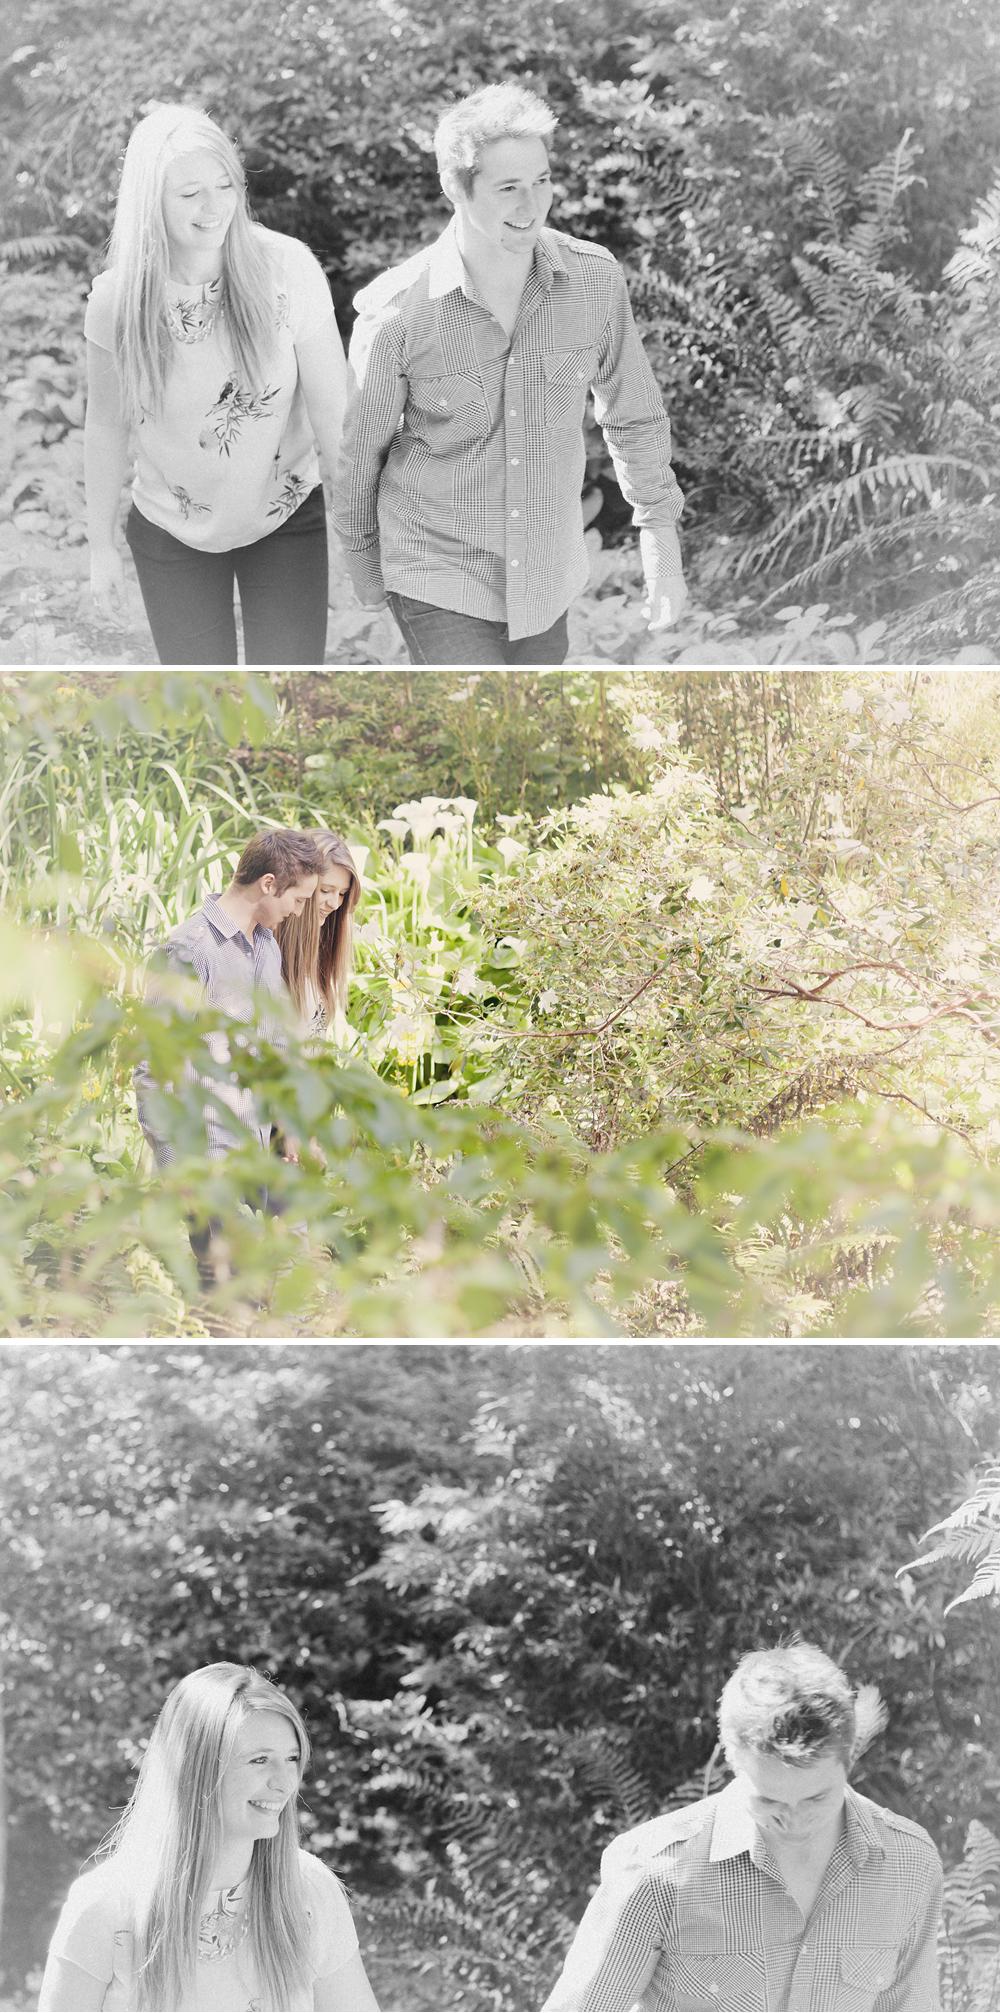 Engagement and wedding photography, Wellington.